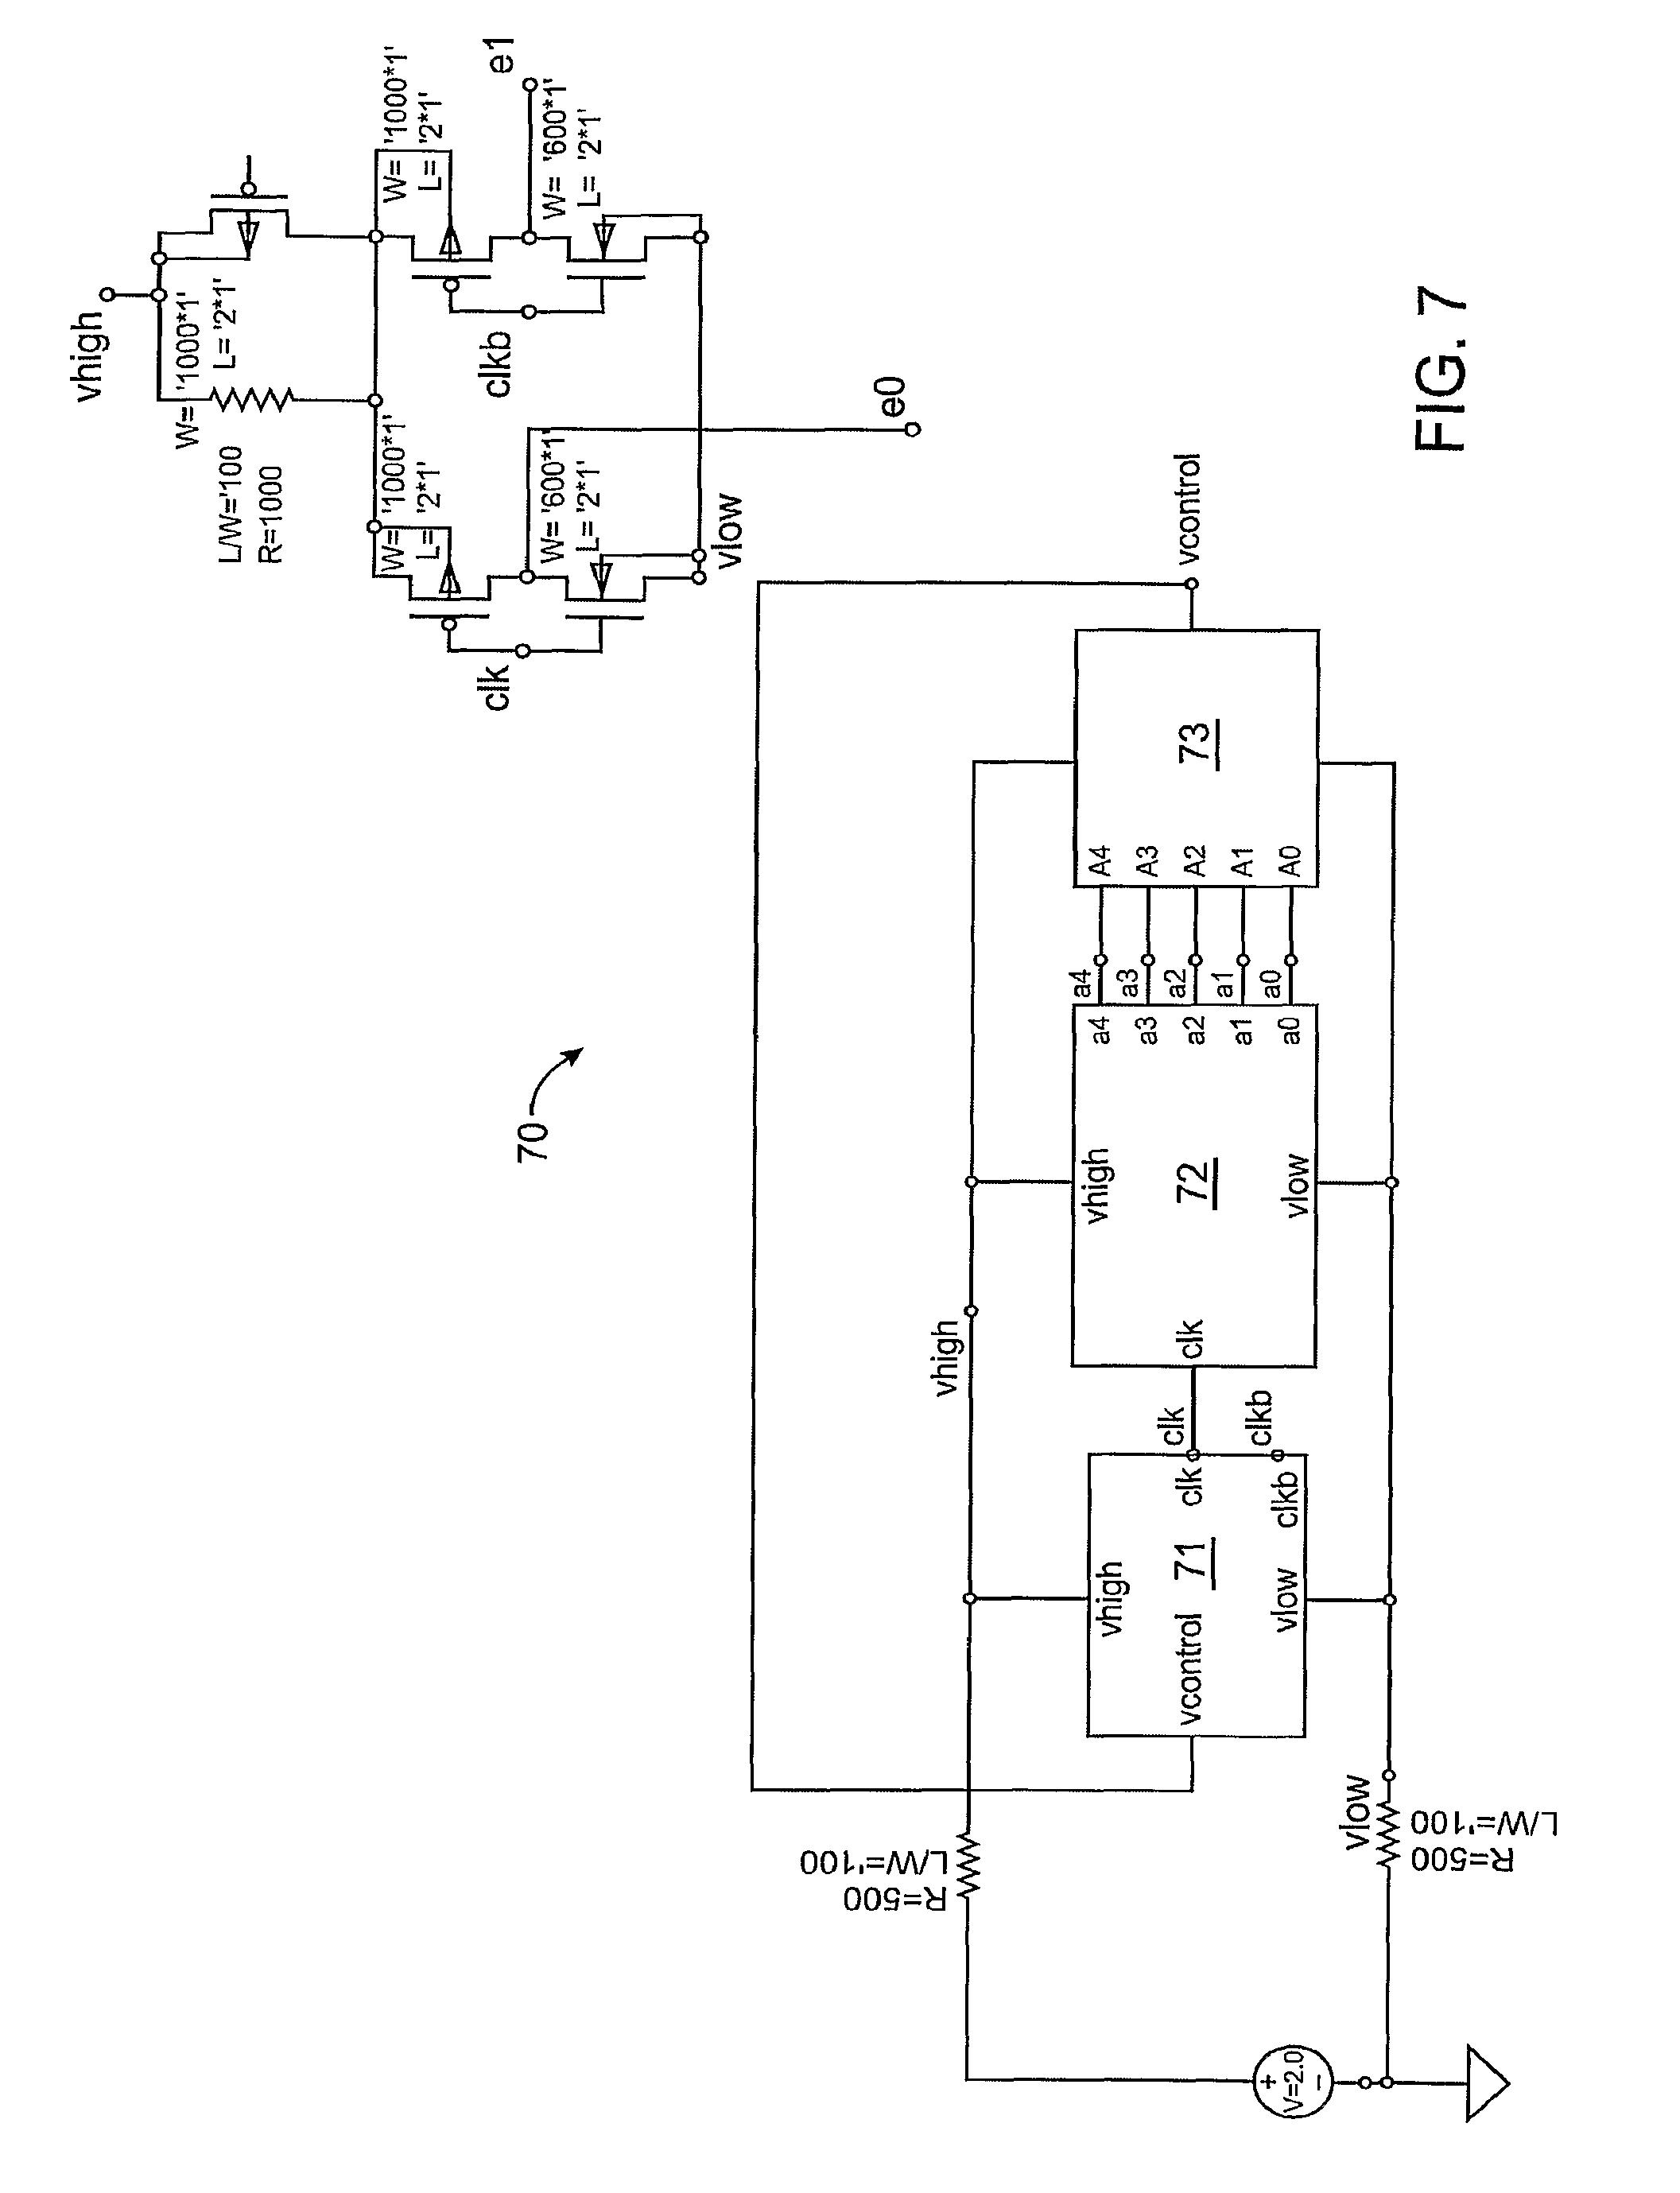 Patent Us 9119554 B2 The Ne555 Fm Modulation Circuit Controlcircuit Diagram